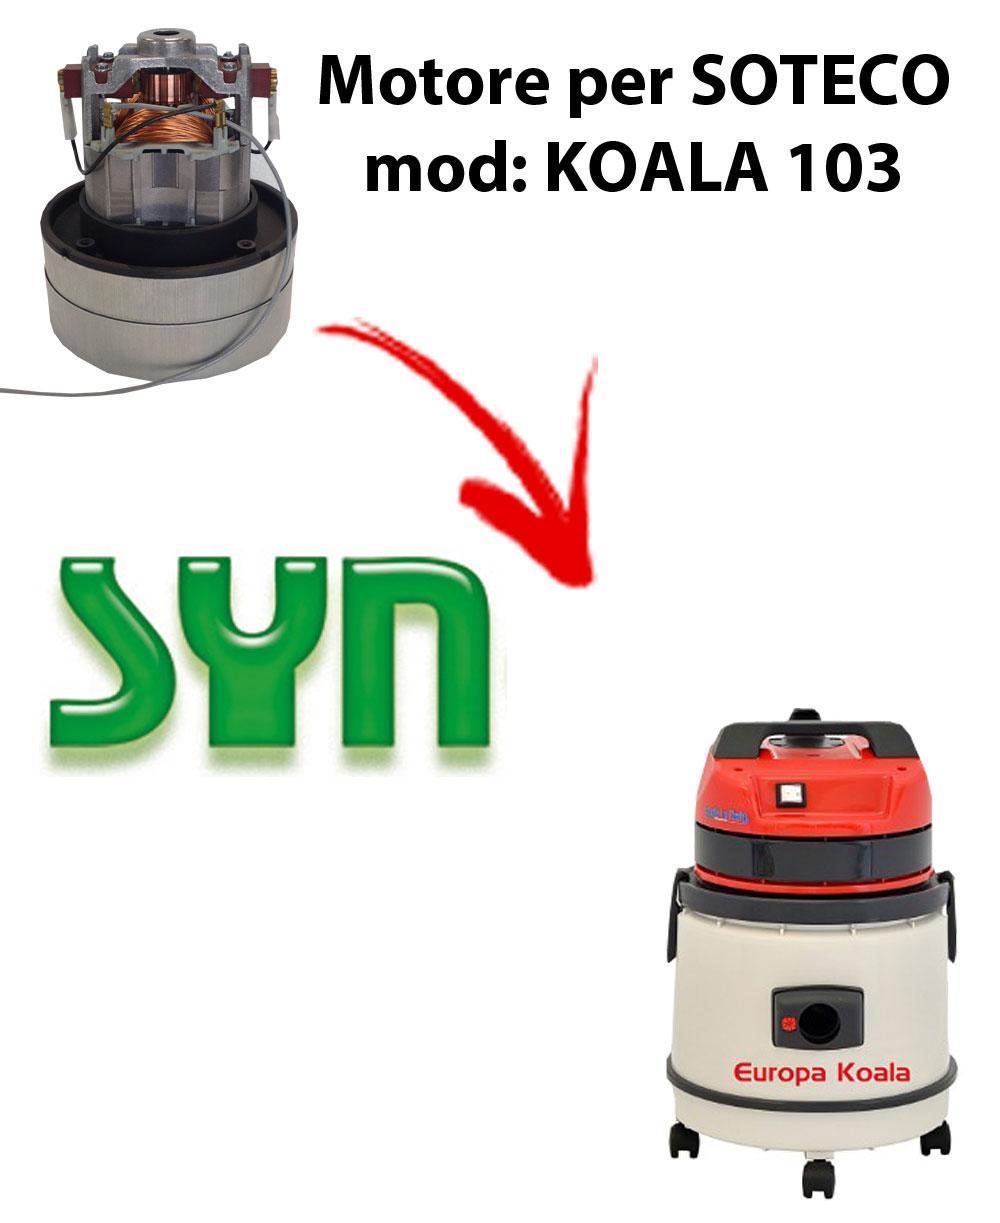 KOALA 103 automatic MOTEUR SYN aspiration pour aspirateur SOTECO